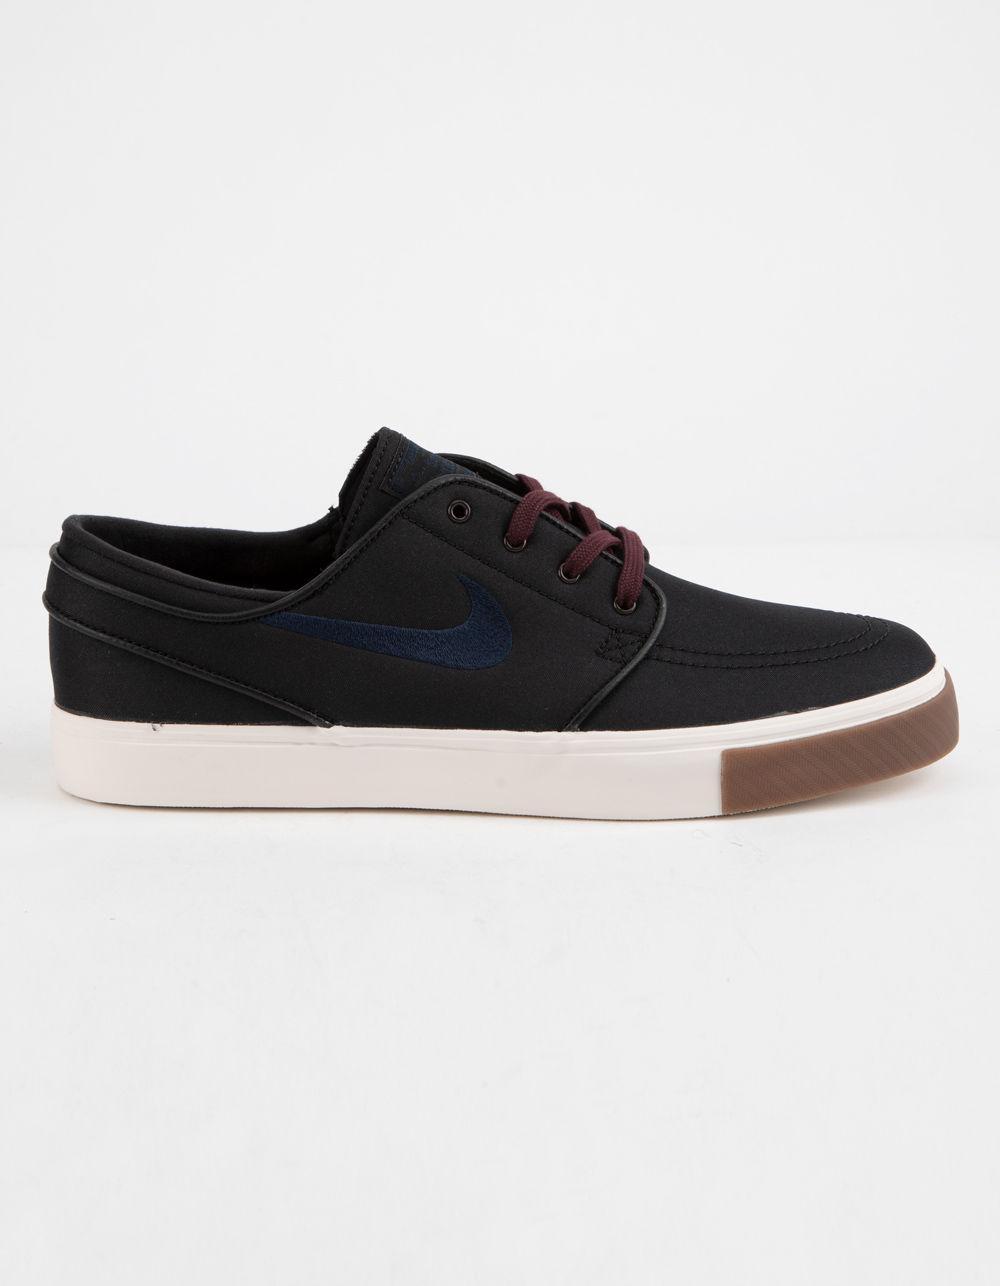 dd2777648c79 Lyst - Nike Zoom Stefan Janoski Canvas Obsidian   Burgundy Shoes in ...